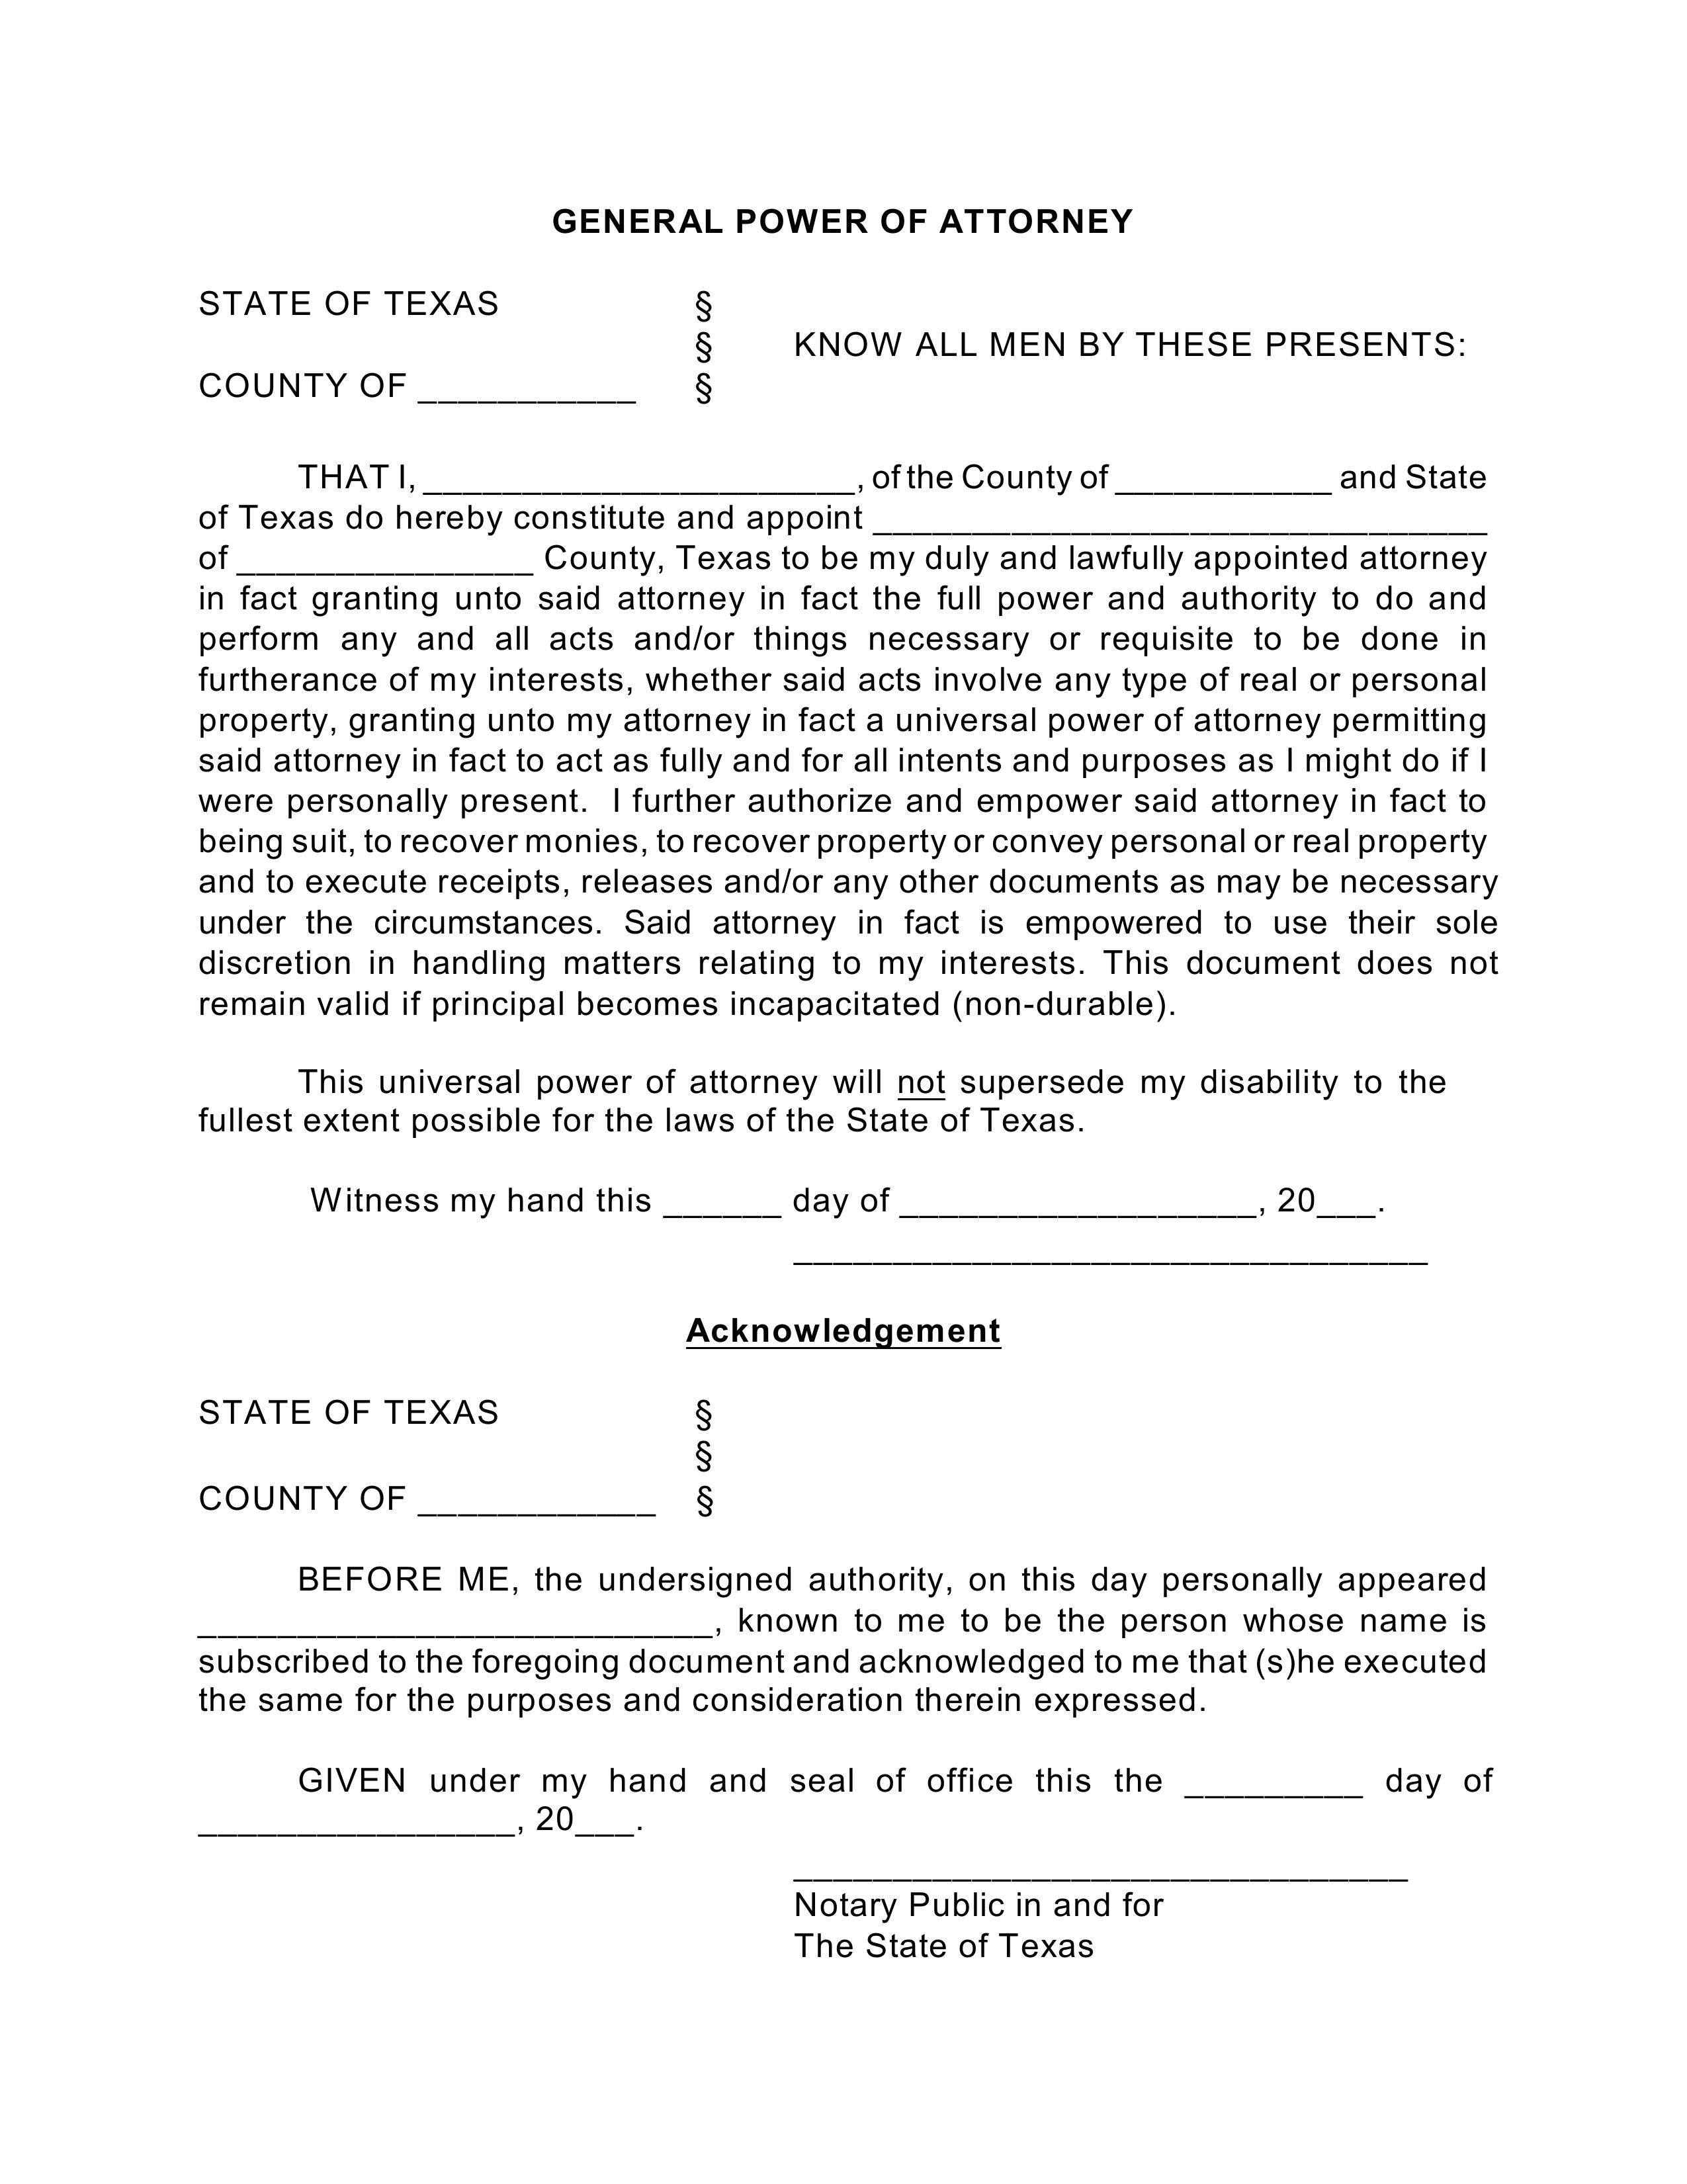 power of attorney form texas  Free Texas General (Financial) Power of Attorney Form - PDF ...